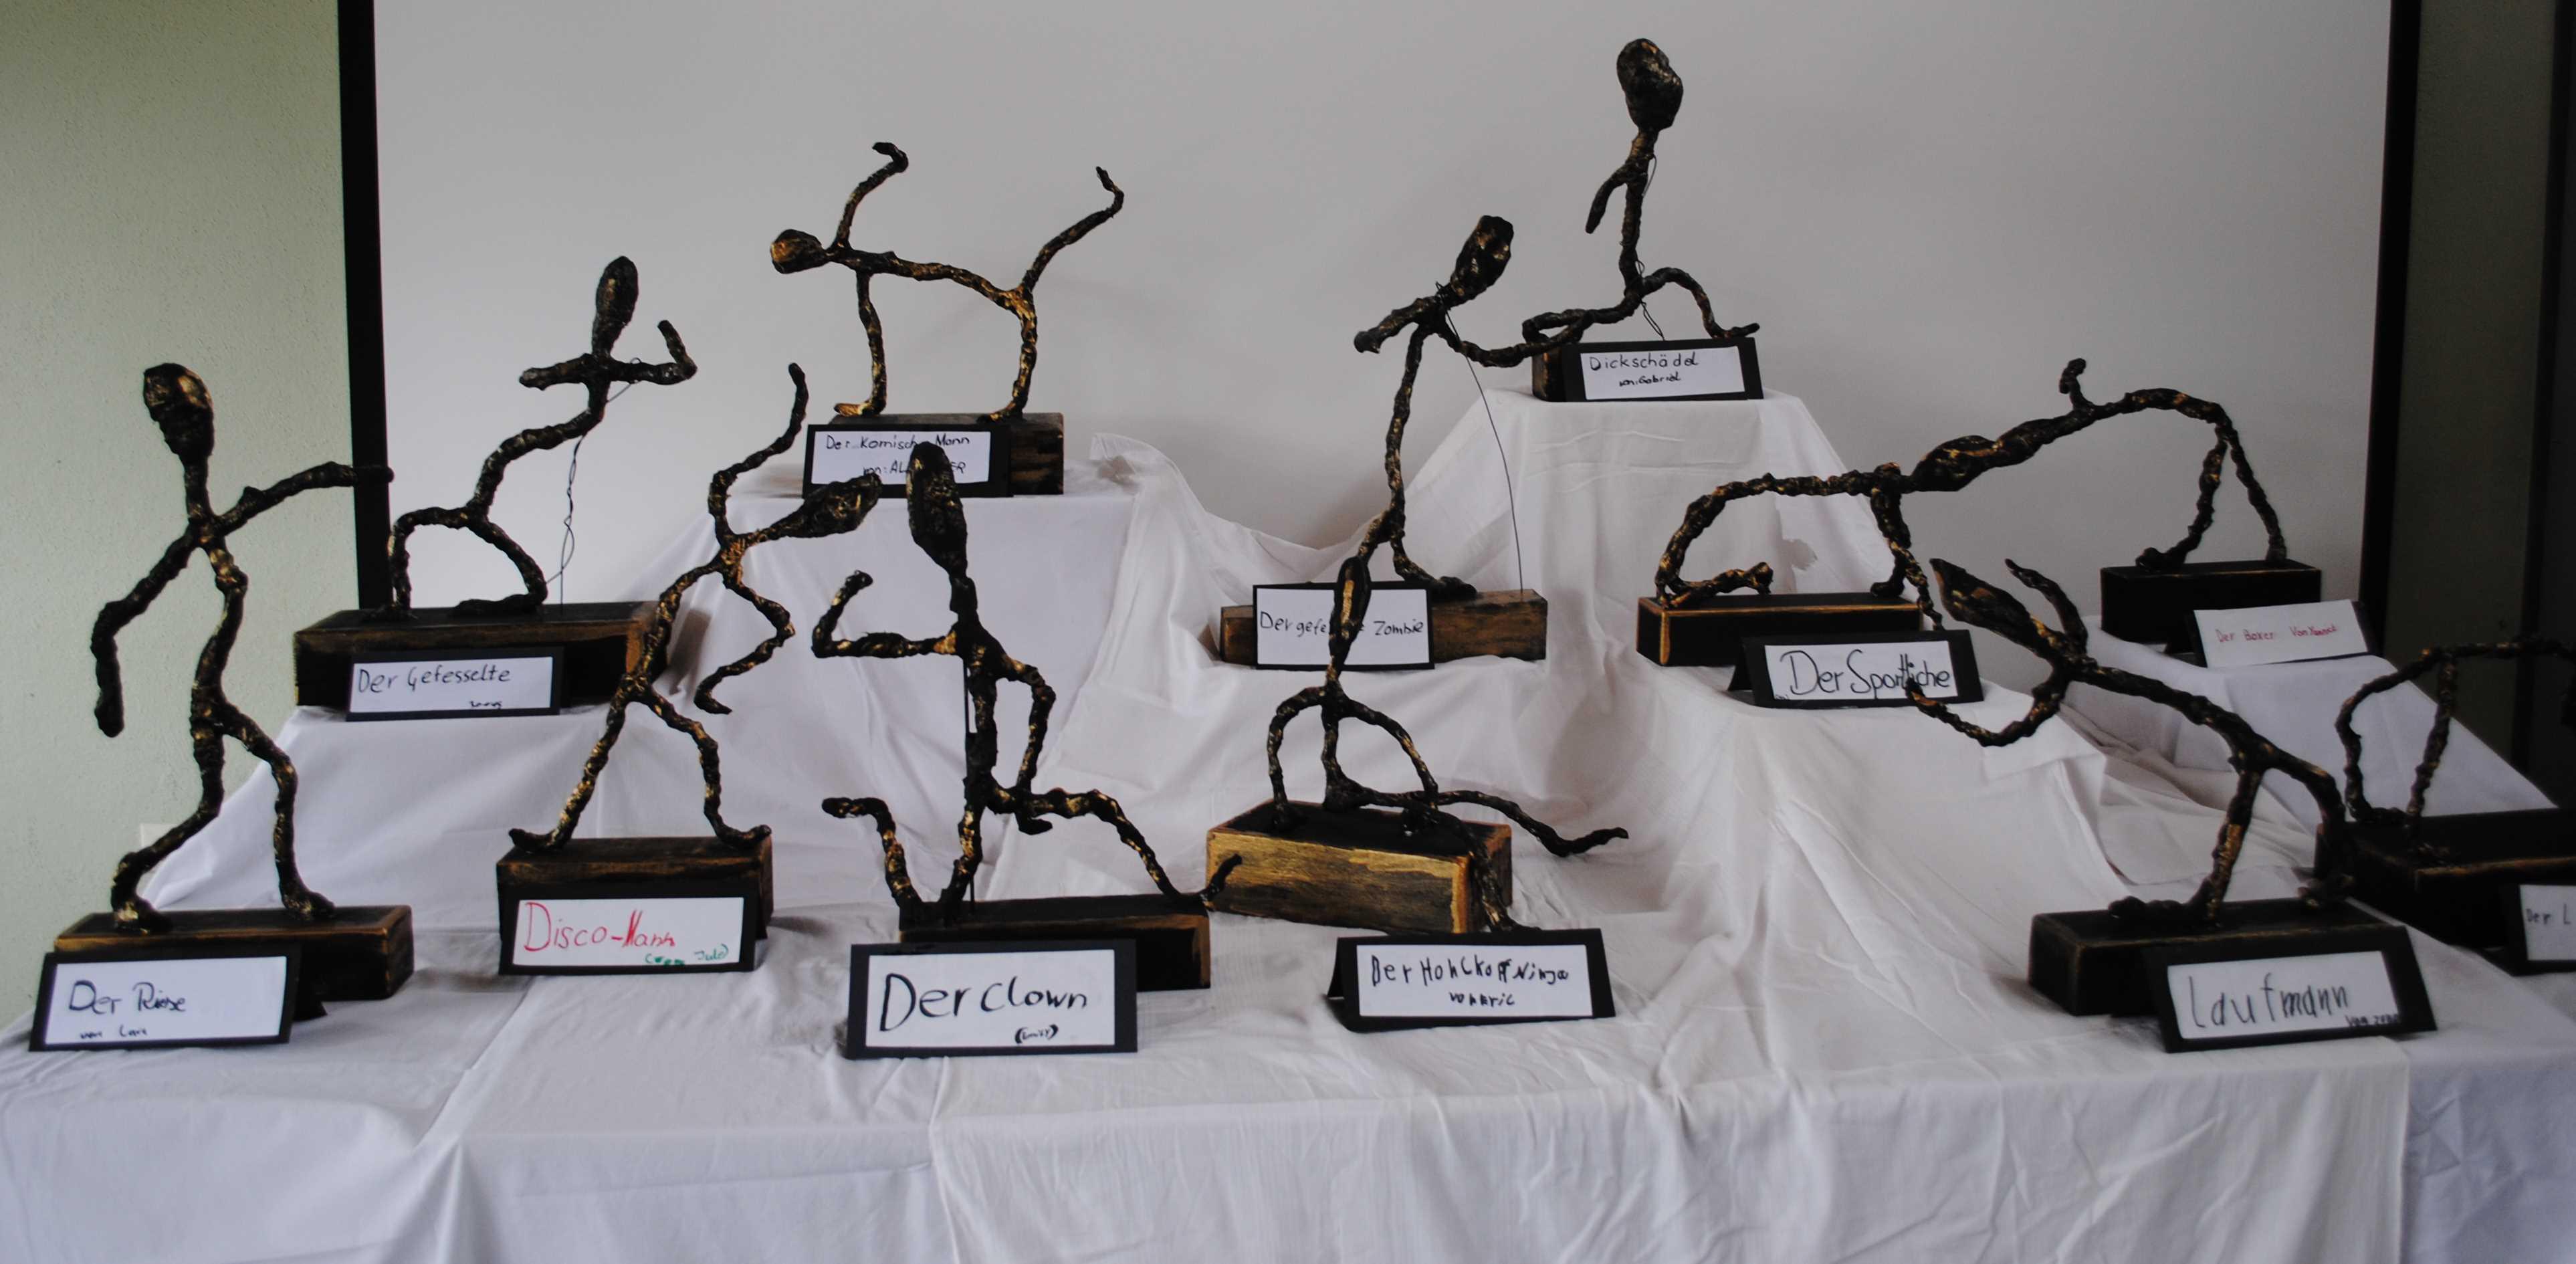 Schülerskulpturen nach Alberto Giacometti.